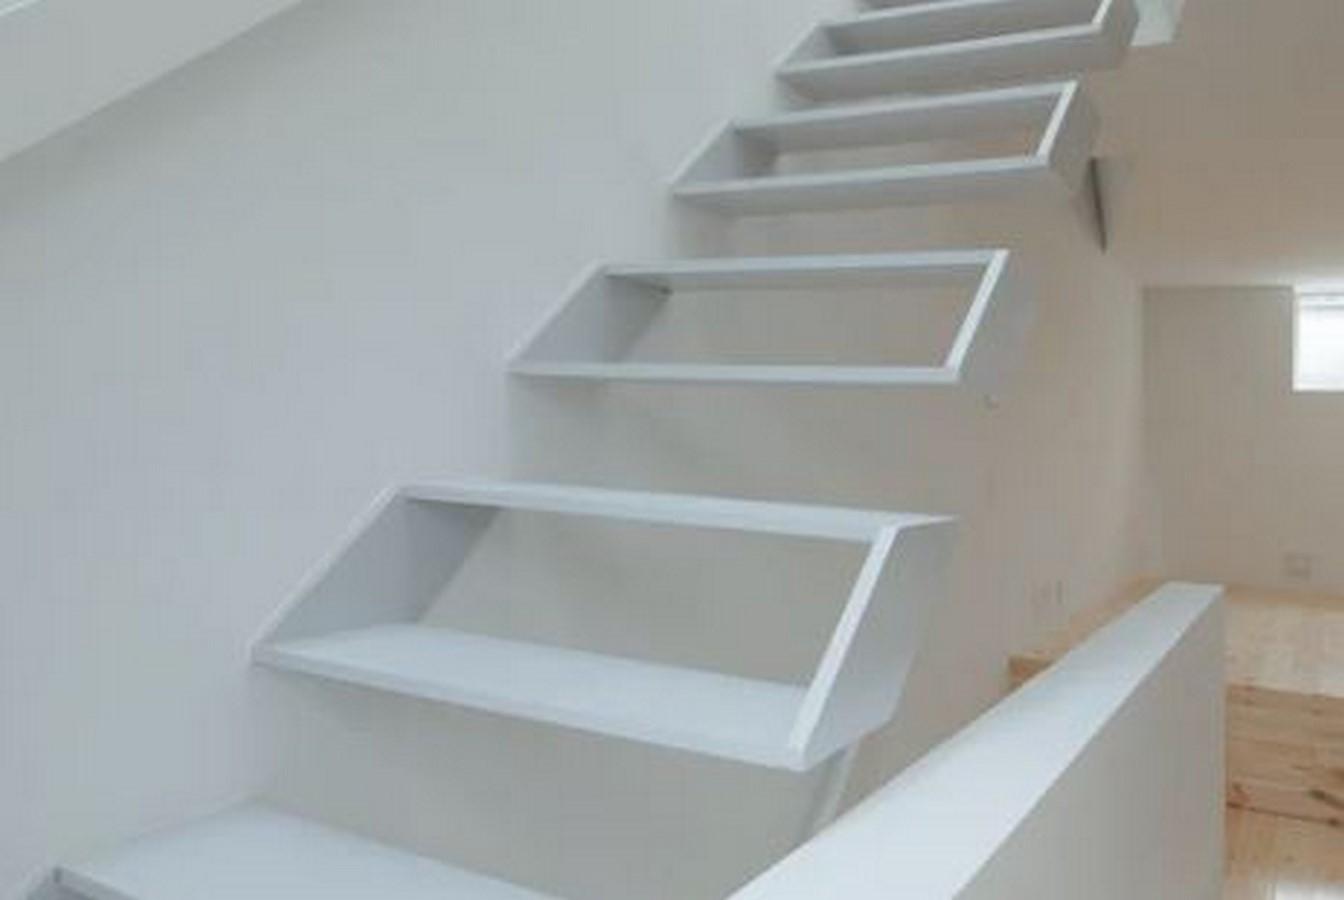 House in Tamatsu by Ido, Kenji Architectural Studio, Japan - Sheet3